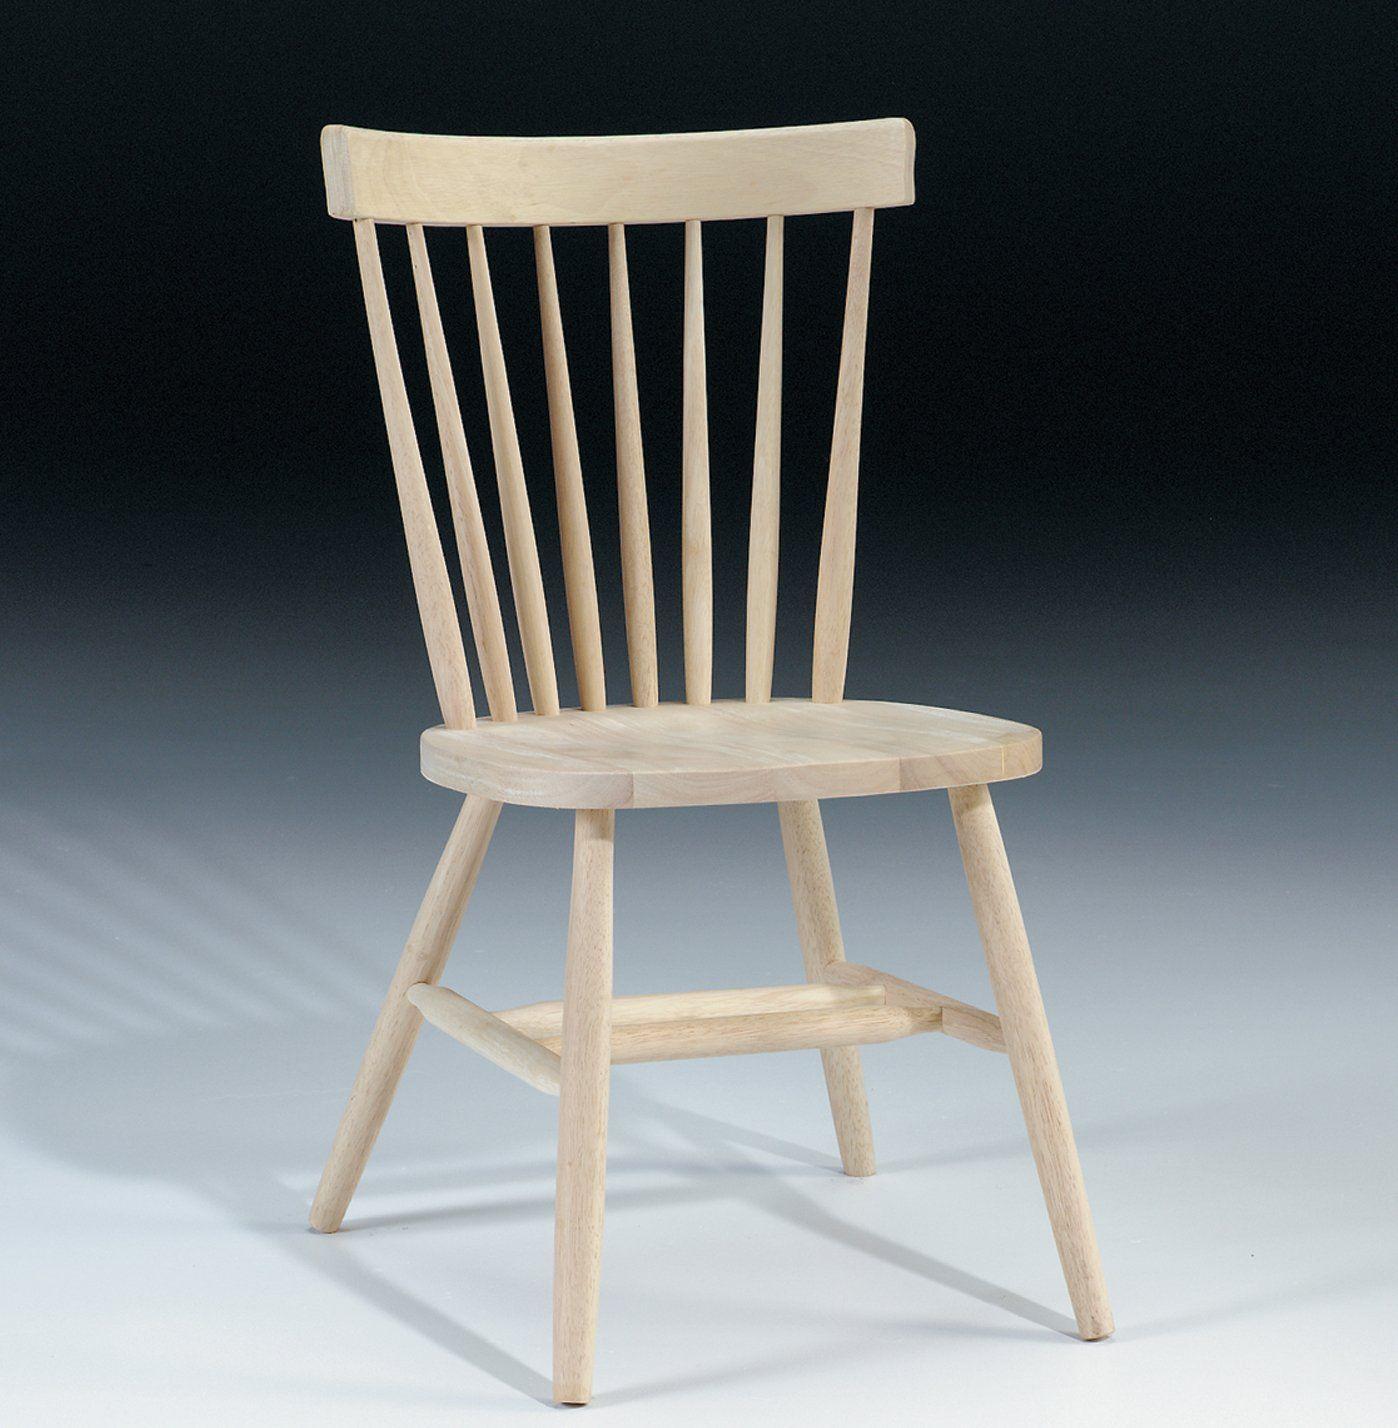 International Concepts Unfinished Copenhagen Chair